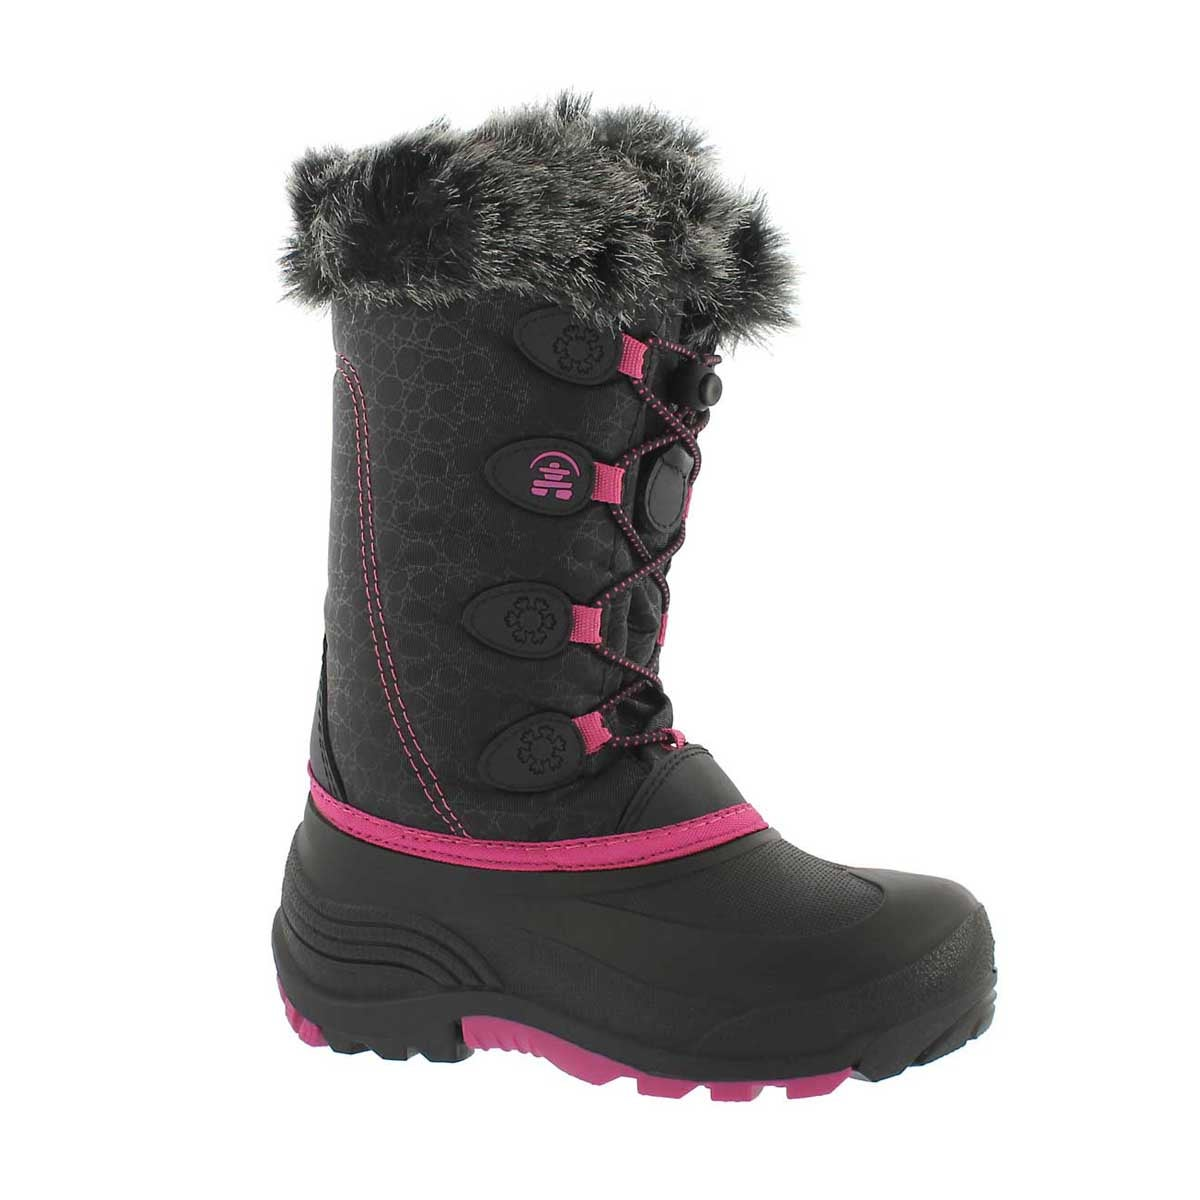 Girls' SNOWGYPSY black/magenta winter boots